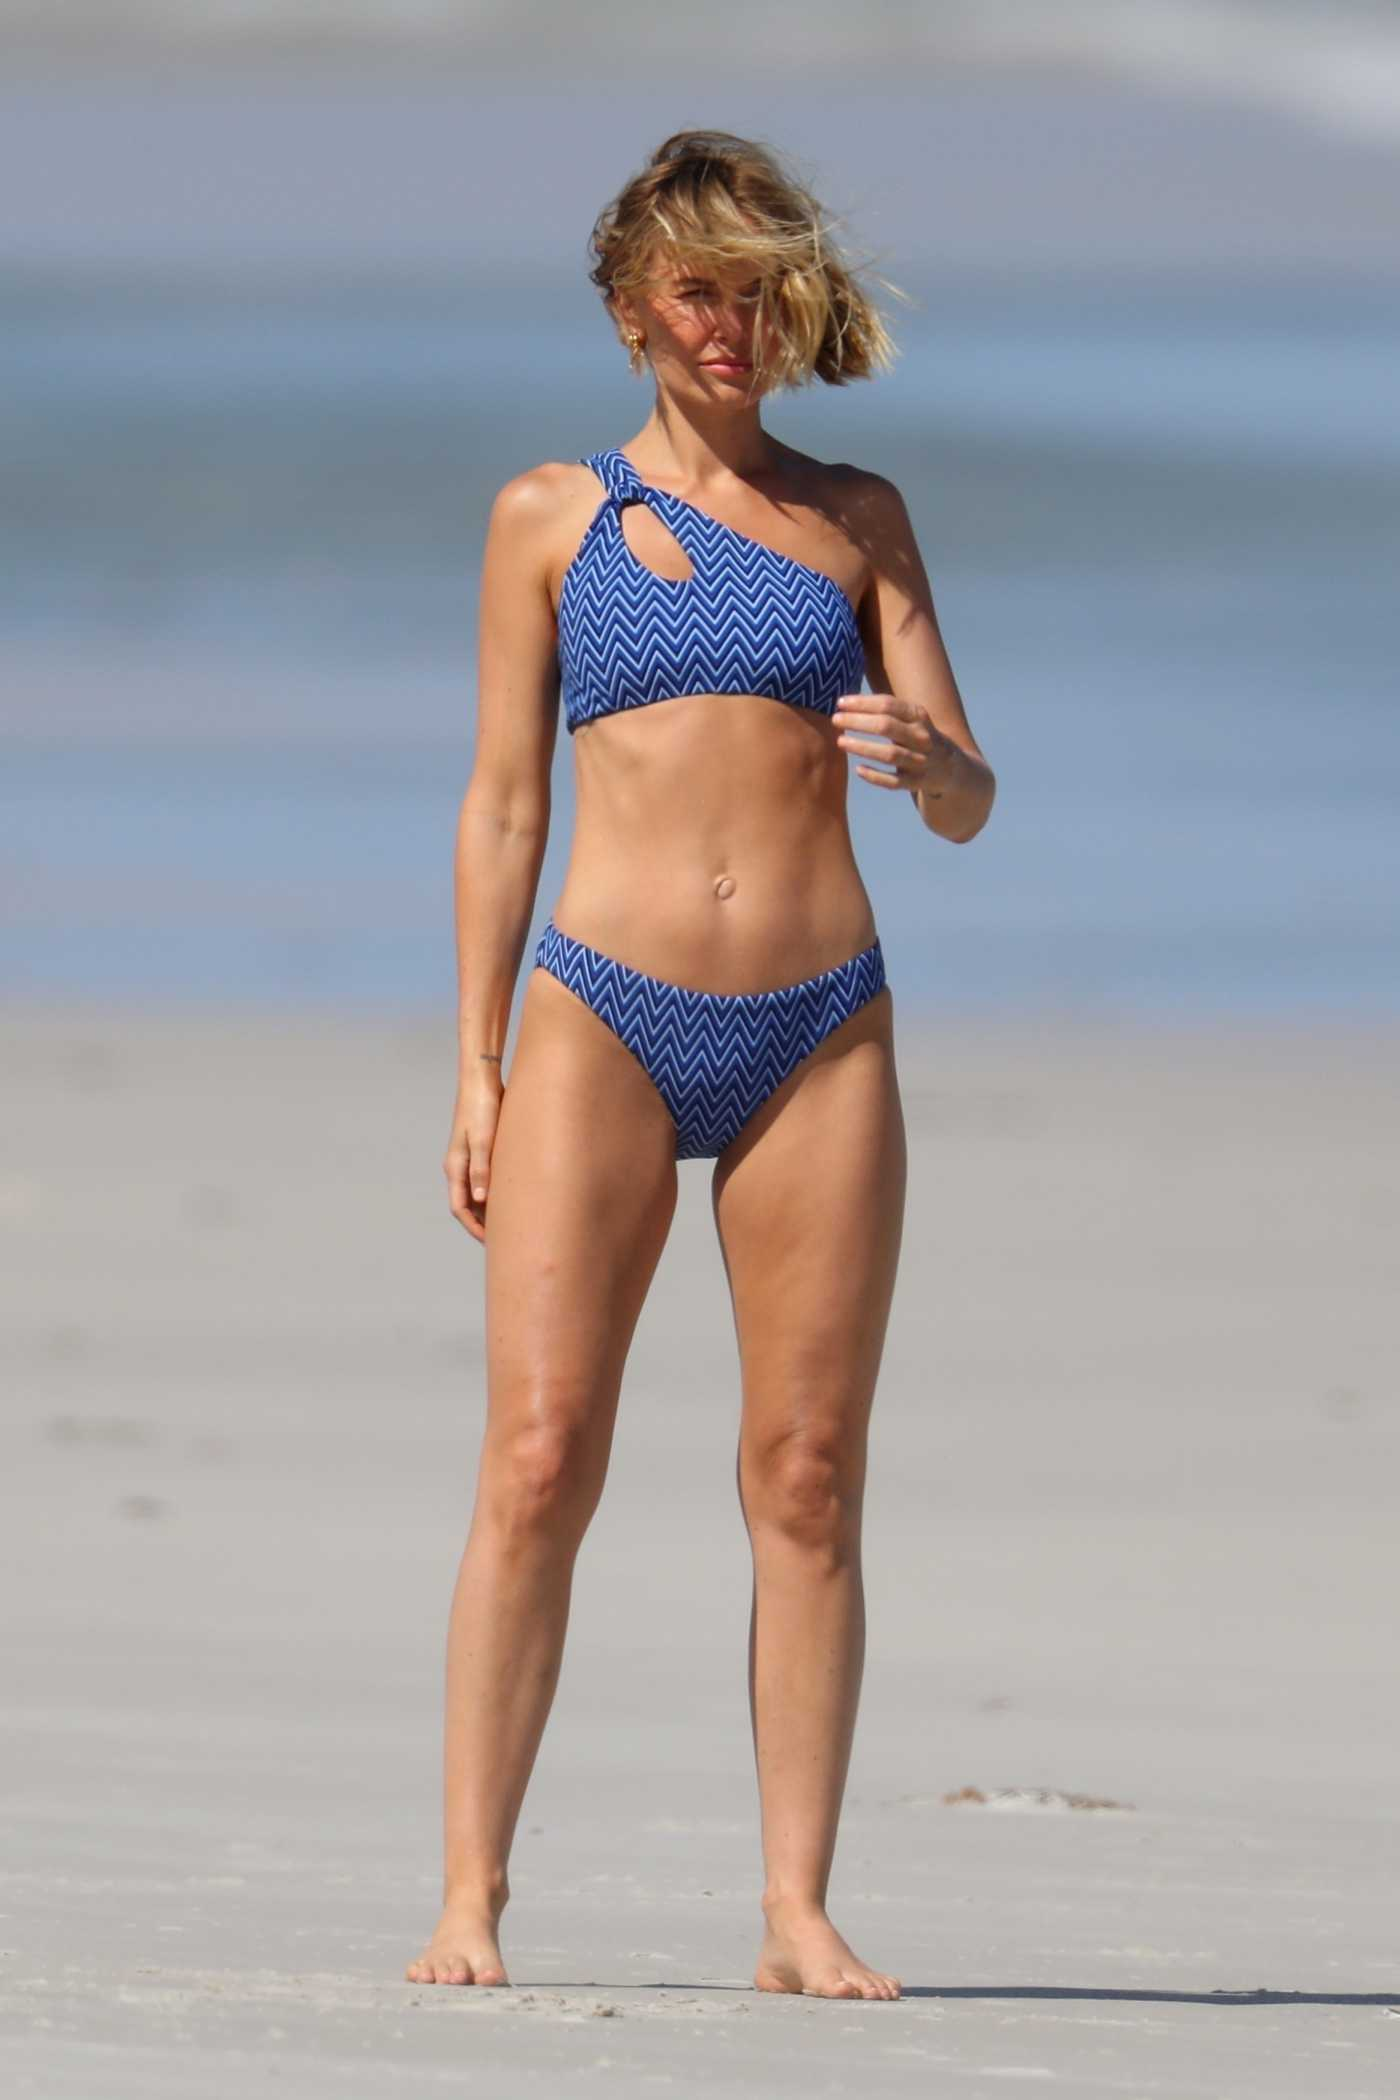 Lara Bingle Does a Bikini Photoshoot on the Beach in Sydney 03/04/2021